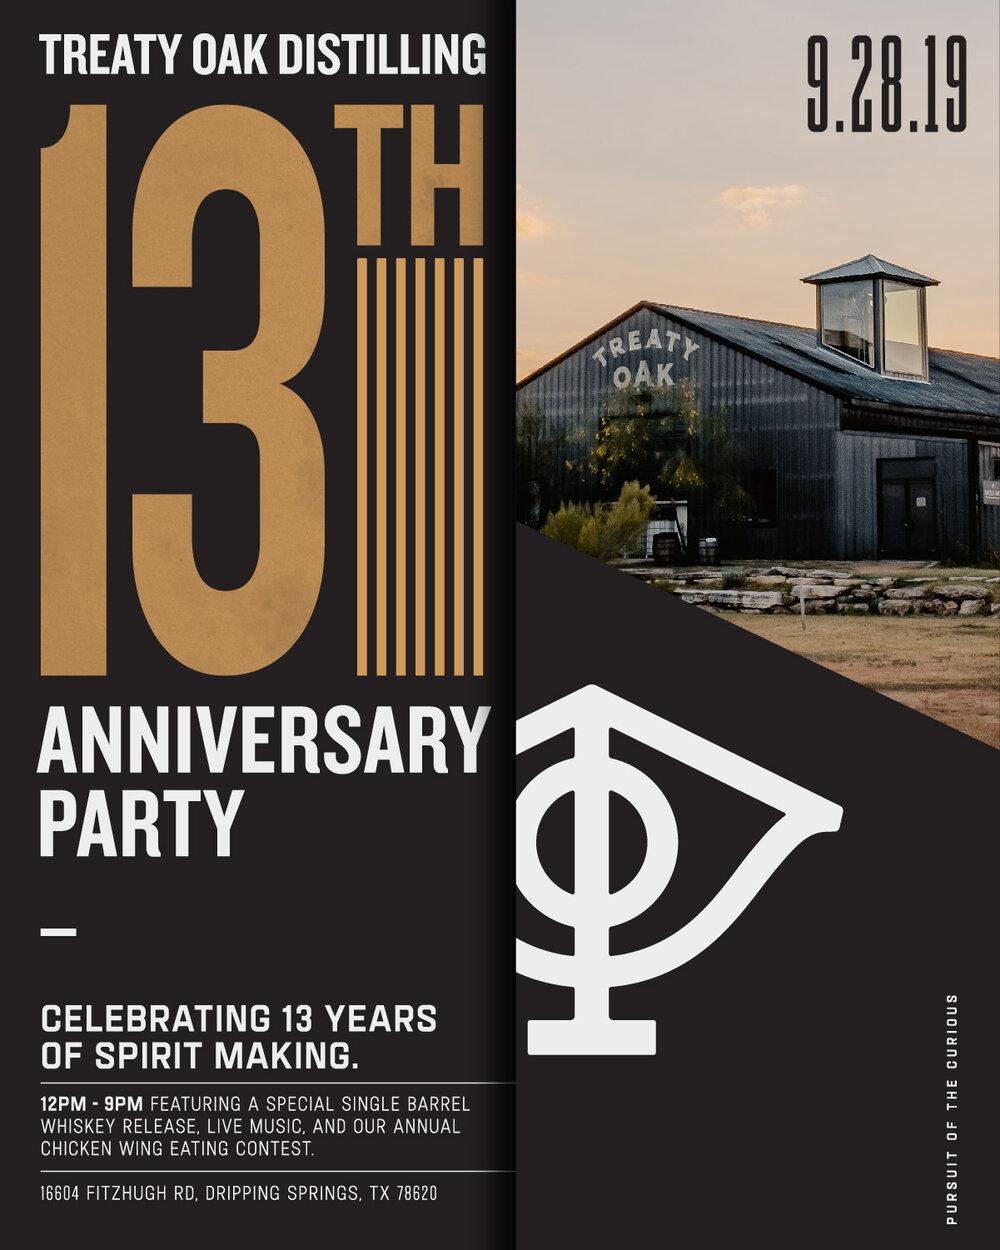 anniversary party 2019-10.jpg